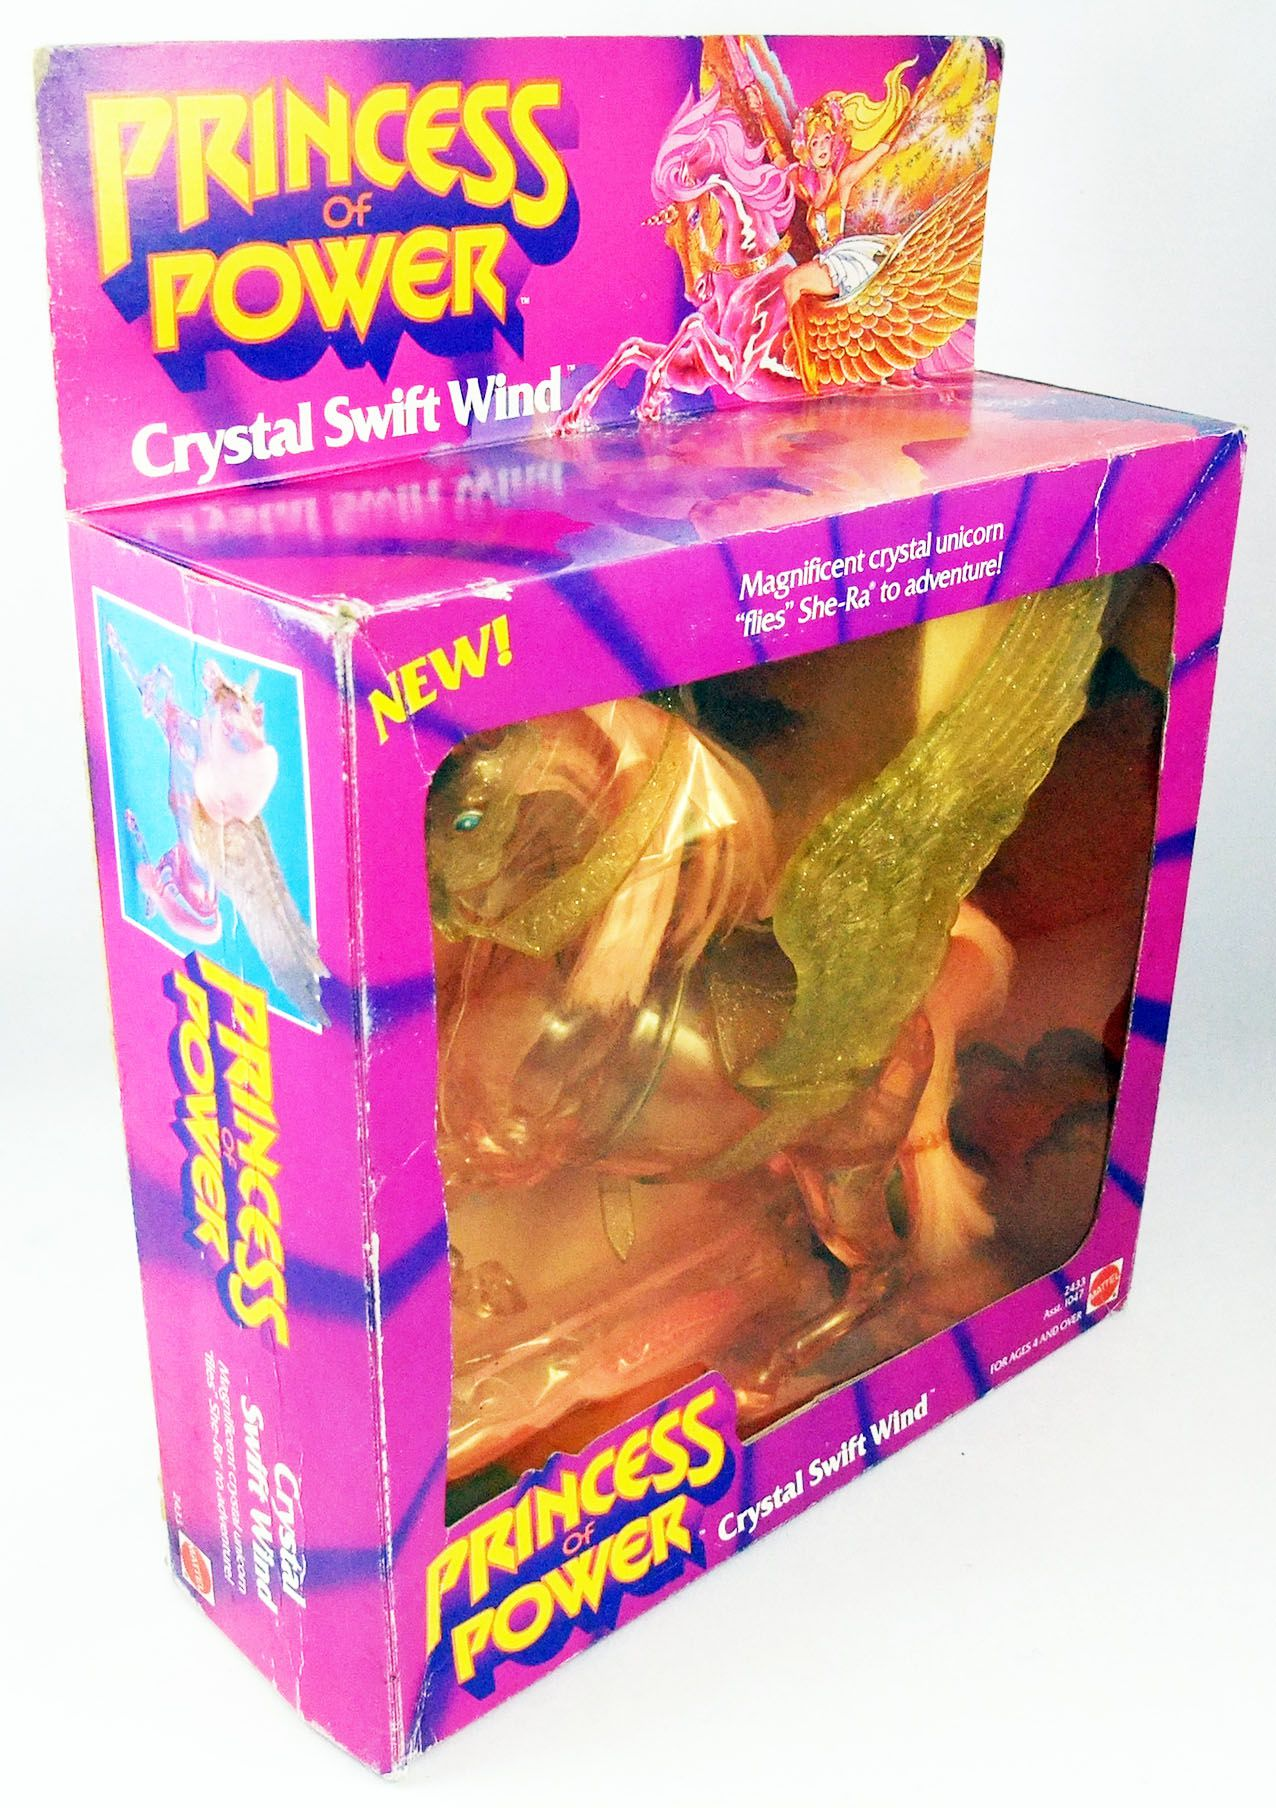 Princess of Power - Crystal Swift Wind / Fougor Cristal (boite USA)